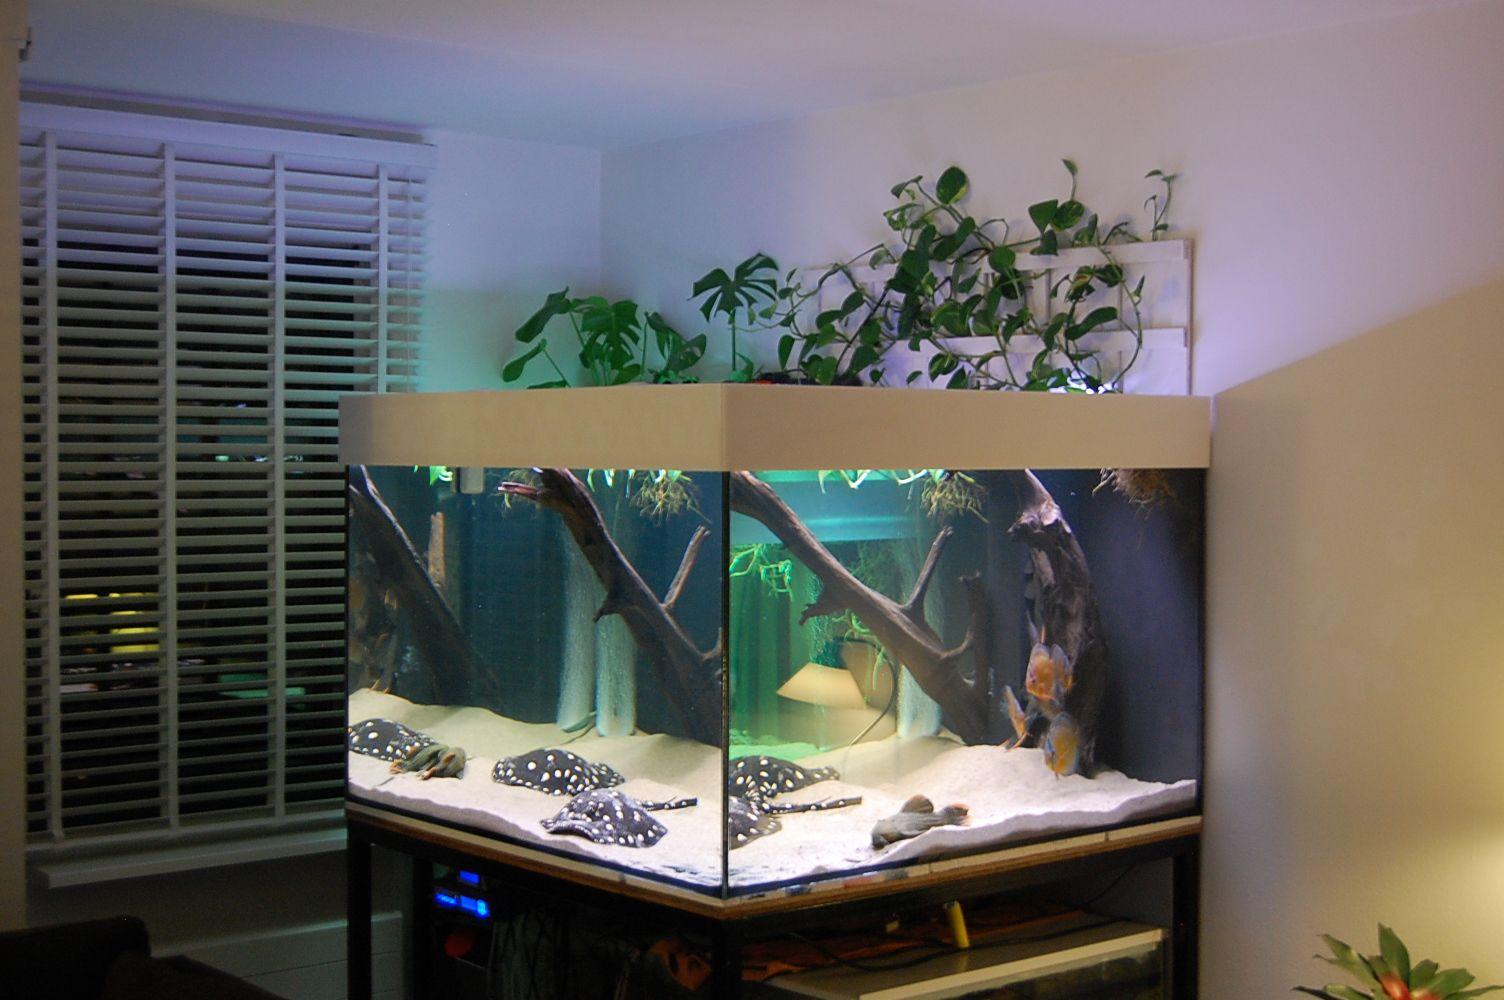 Fish aquarium ideas - Next Tank I Have Has To Be Big Enough For Teacup Stingrays Aquarium Aquascapefish Aquariumsaquarium Ideasaquarium